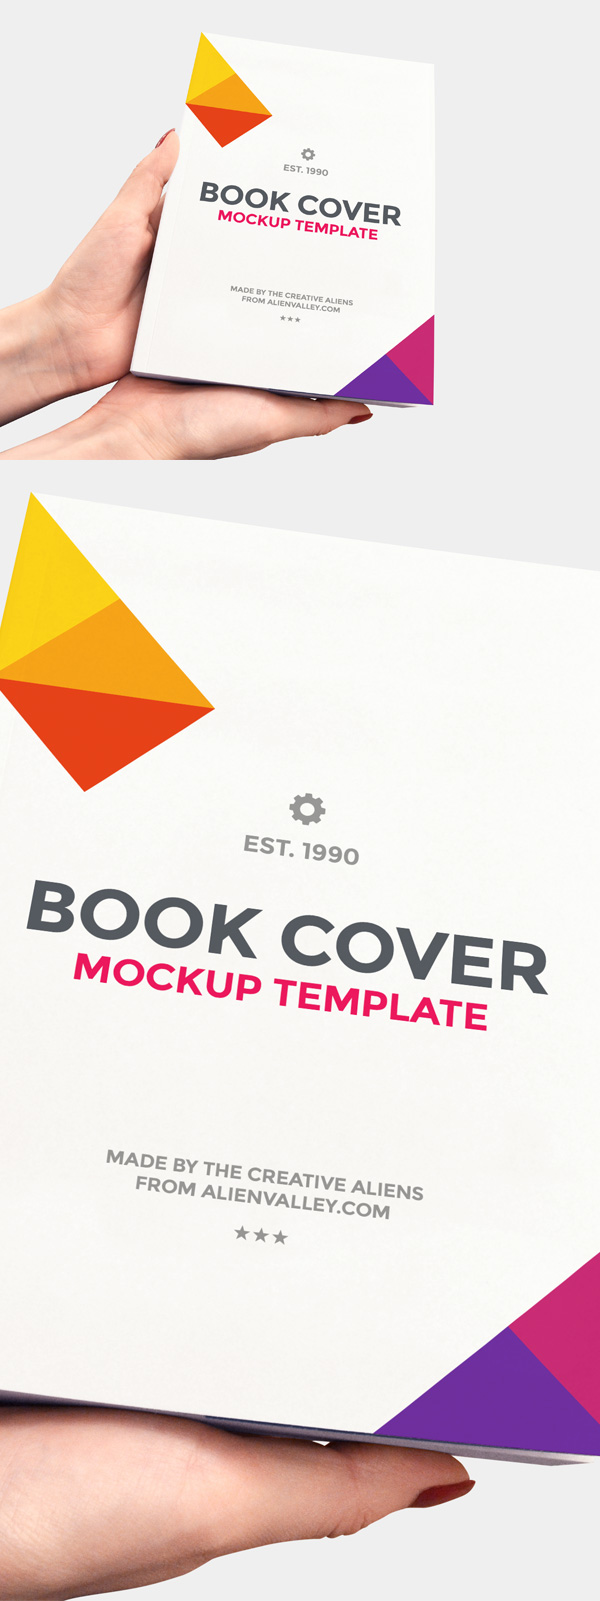 21 Free Book Cover Mockup